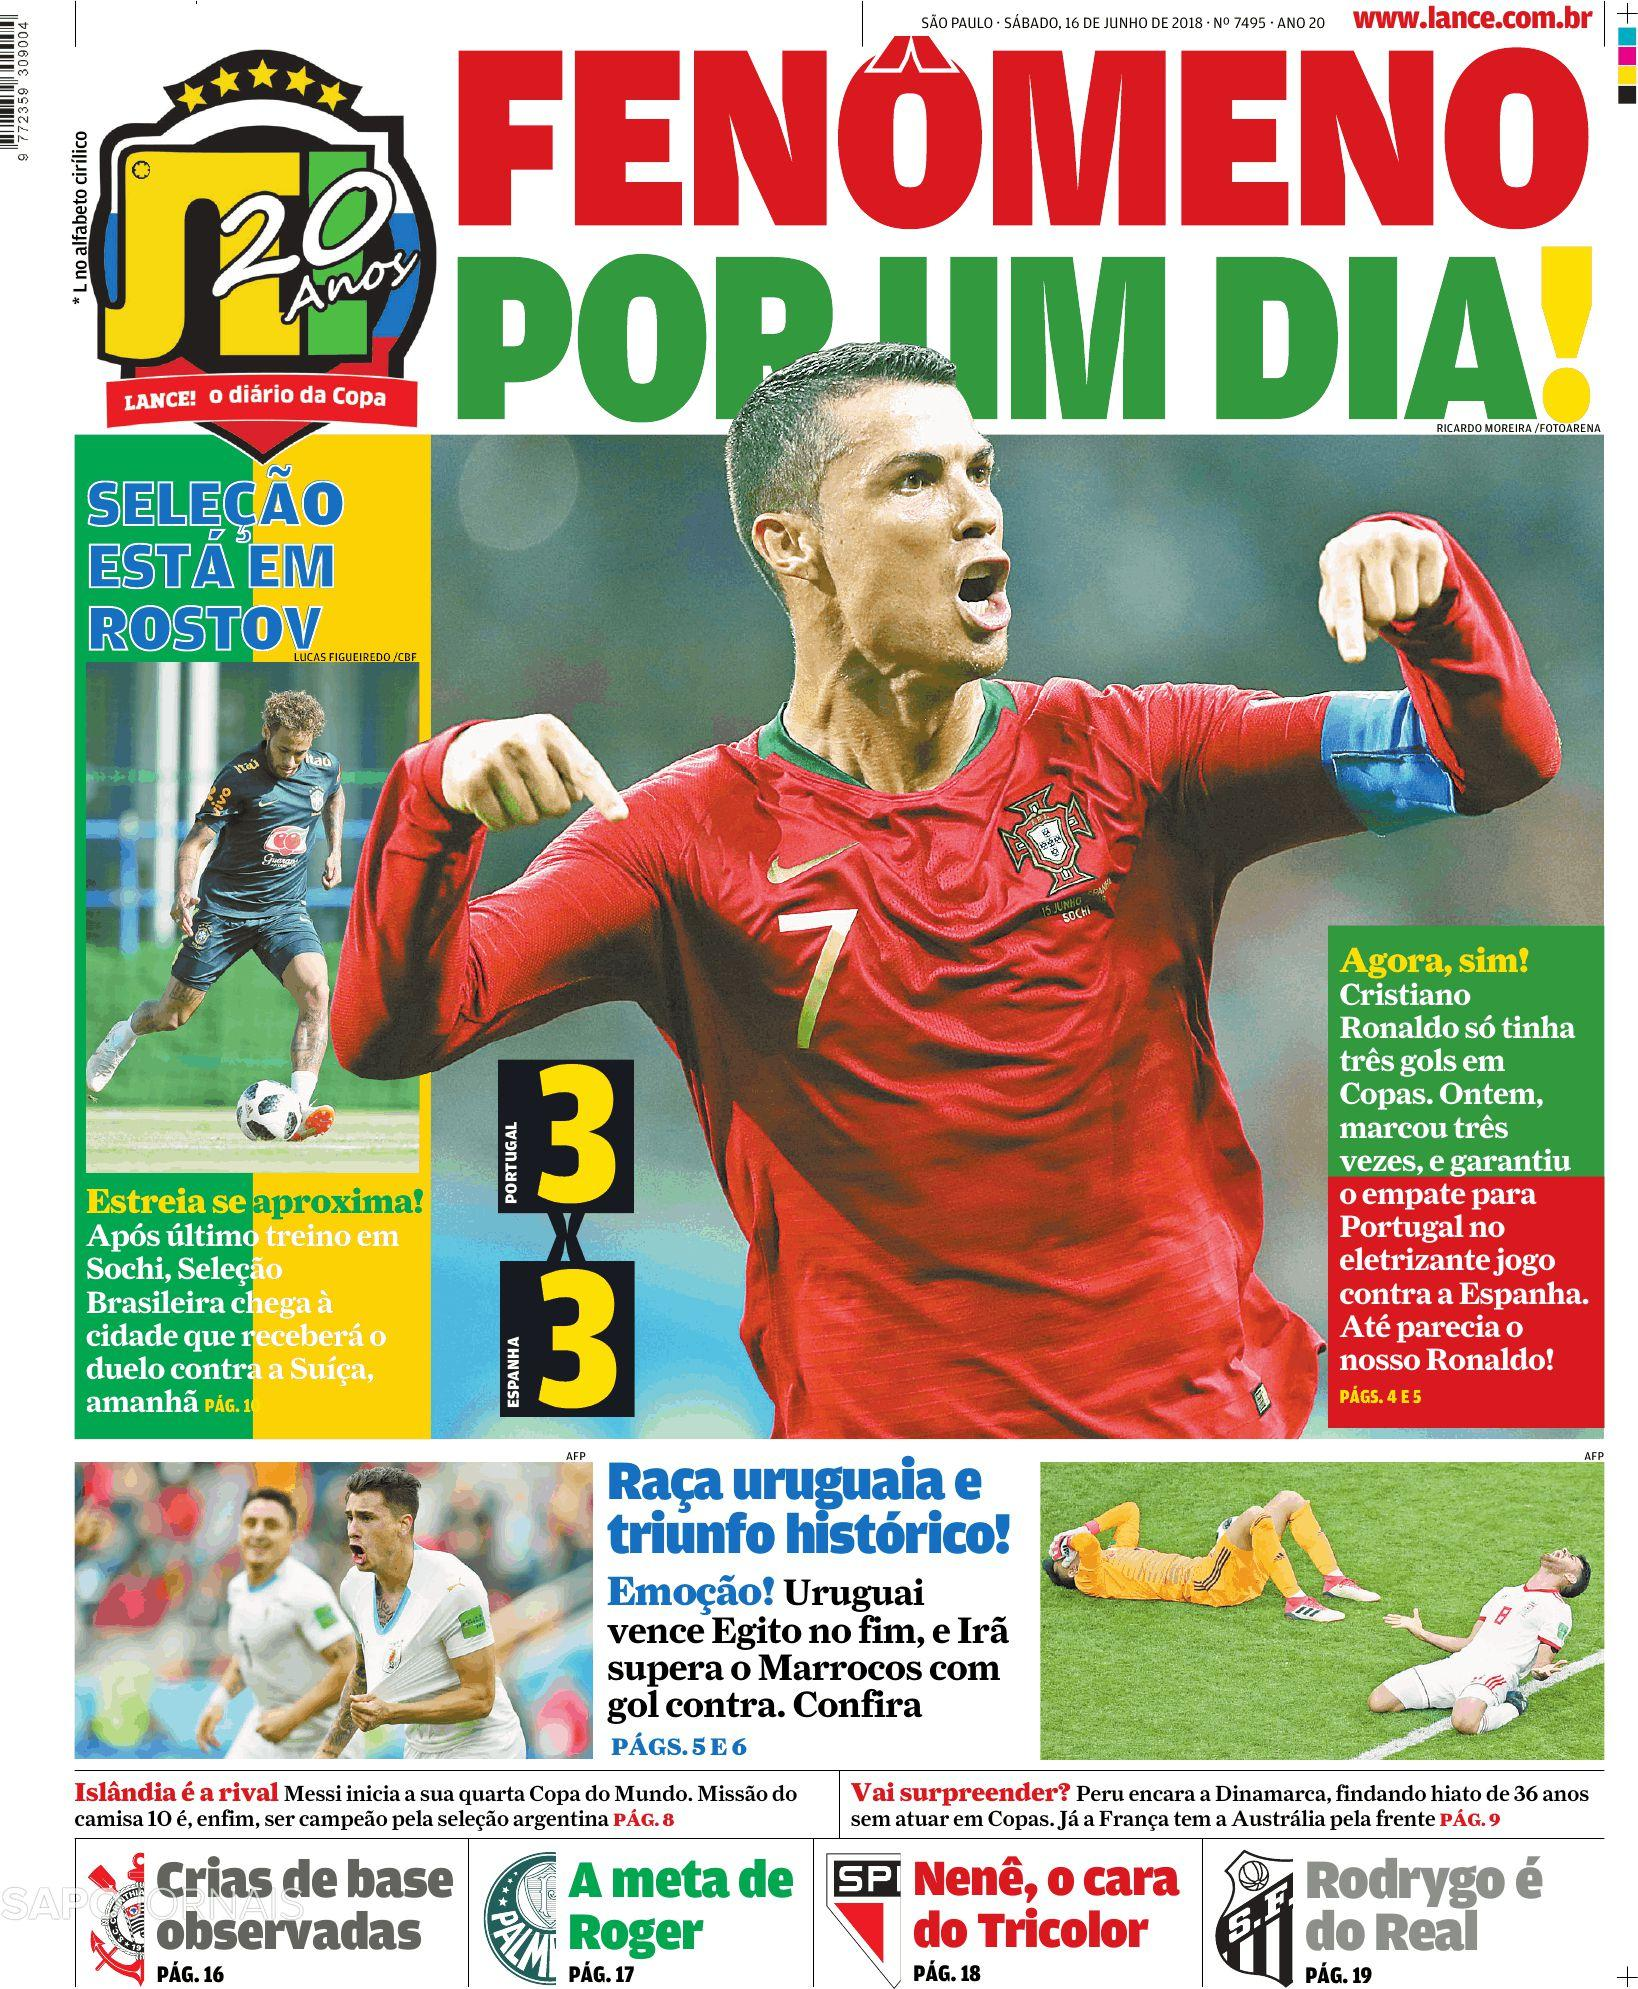 Quiosque  Ronaldo divinal 99d99ba7905d9